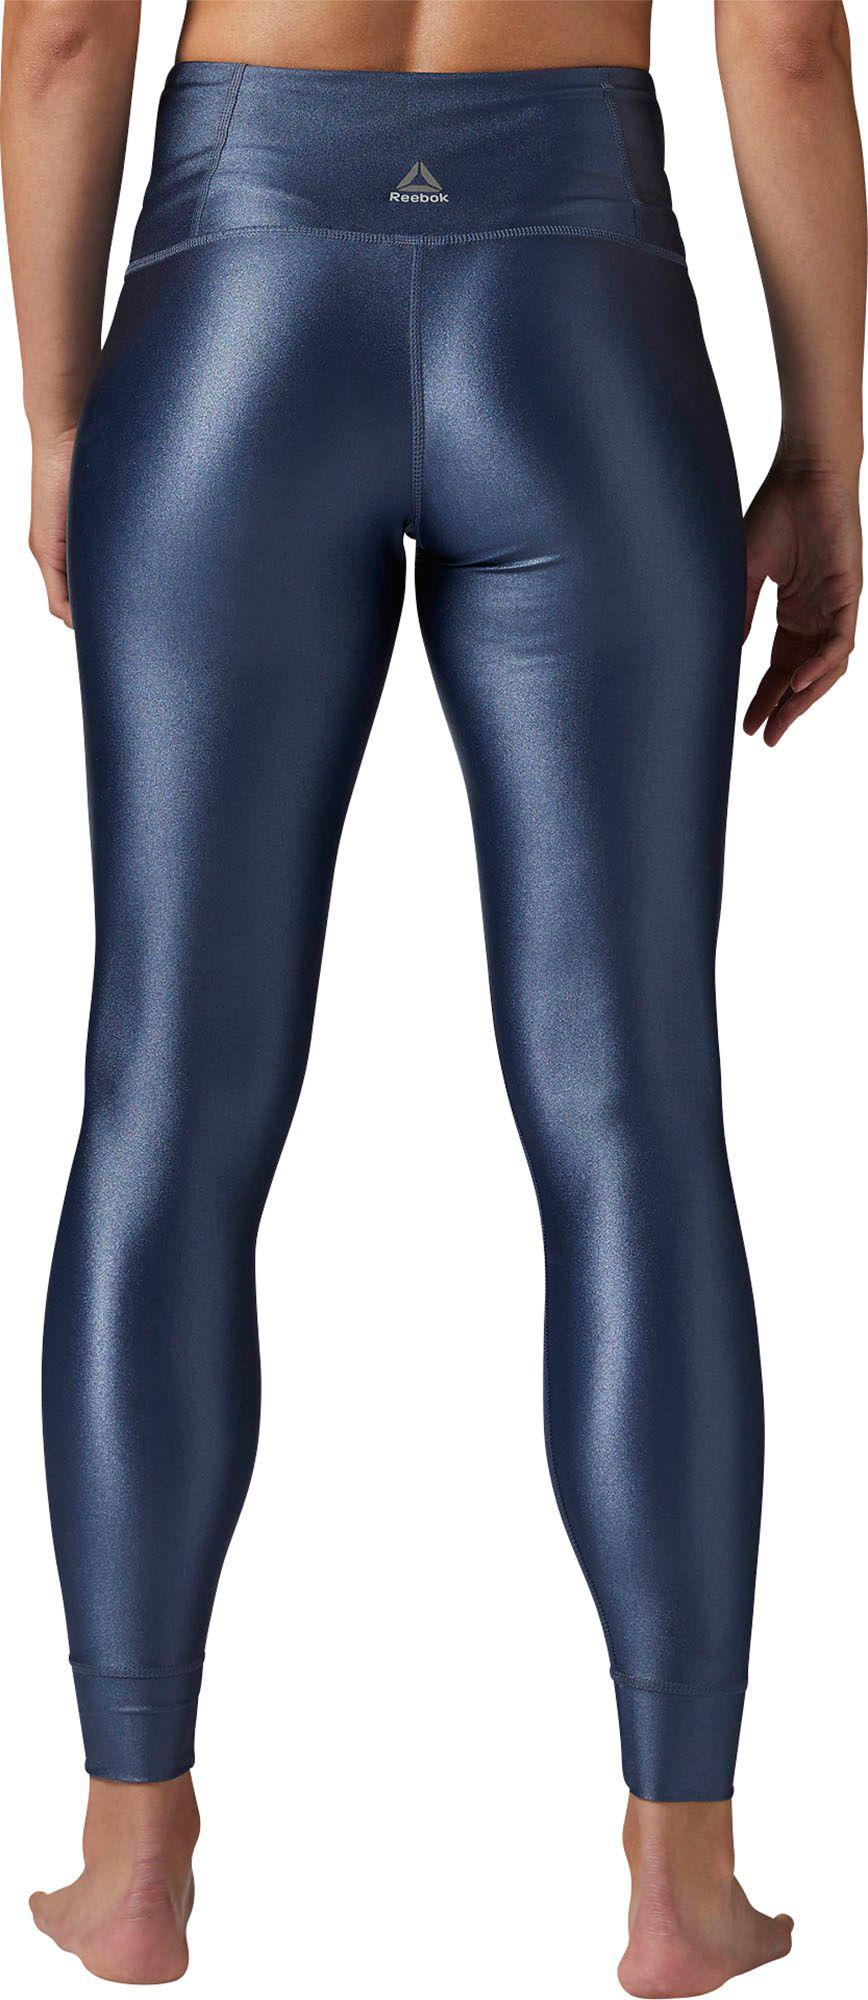 6f42c0608a4836 Reebok Metallic High Rise Leggings in Blue - Lyst